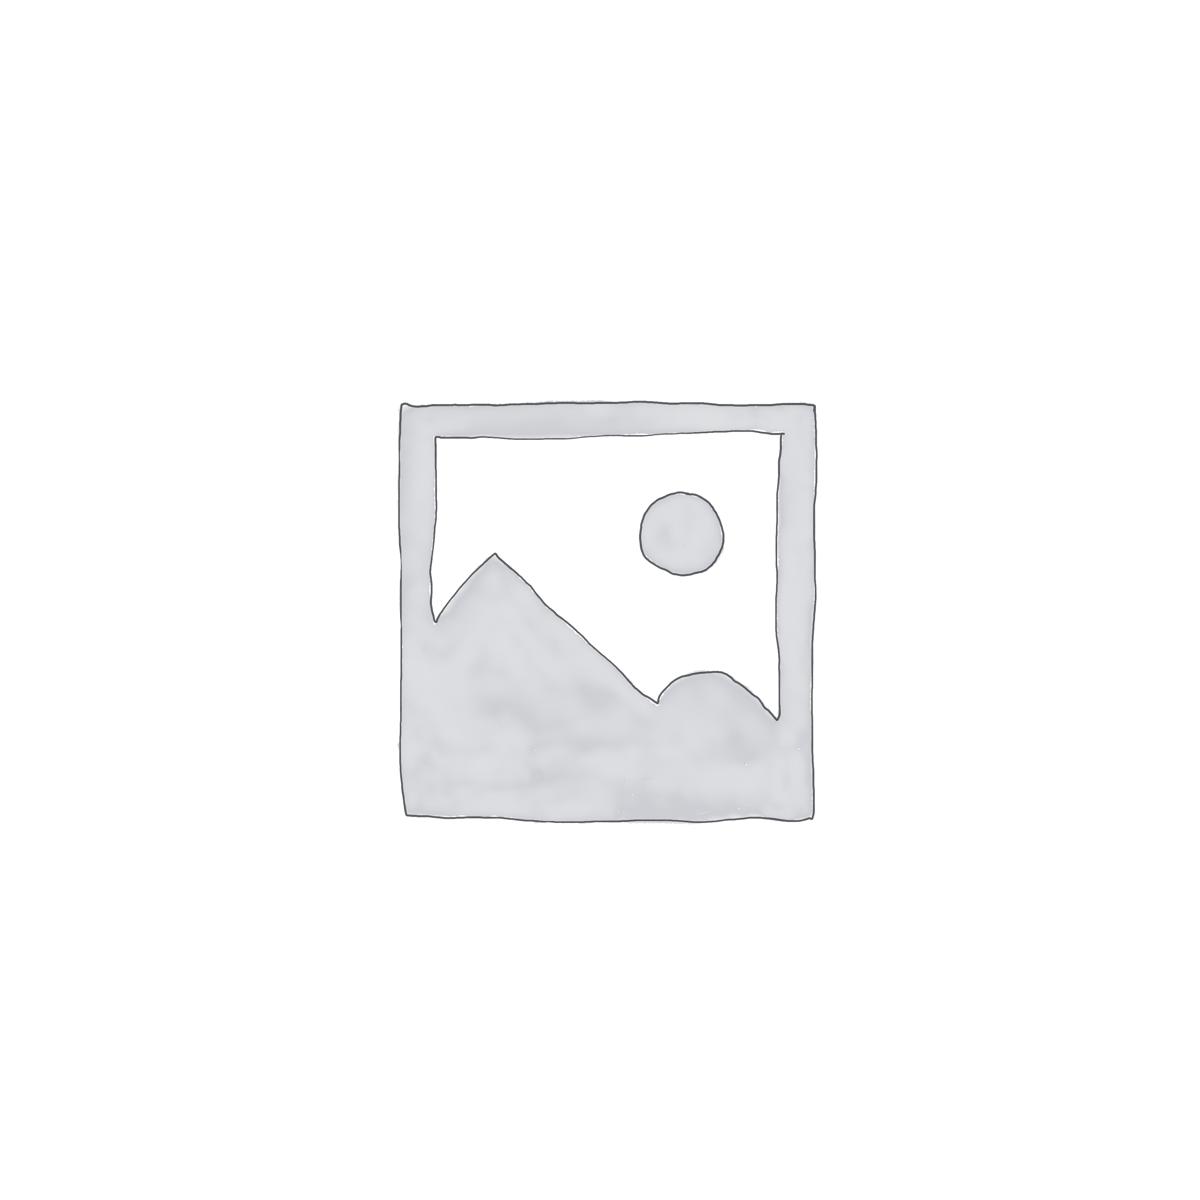 3D Embossed Look Oil Painting White Blossom Tree Wallpaper Mural